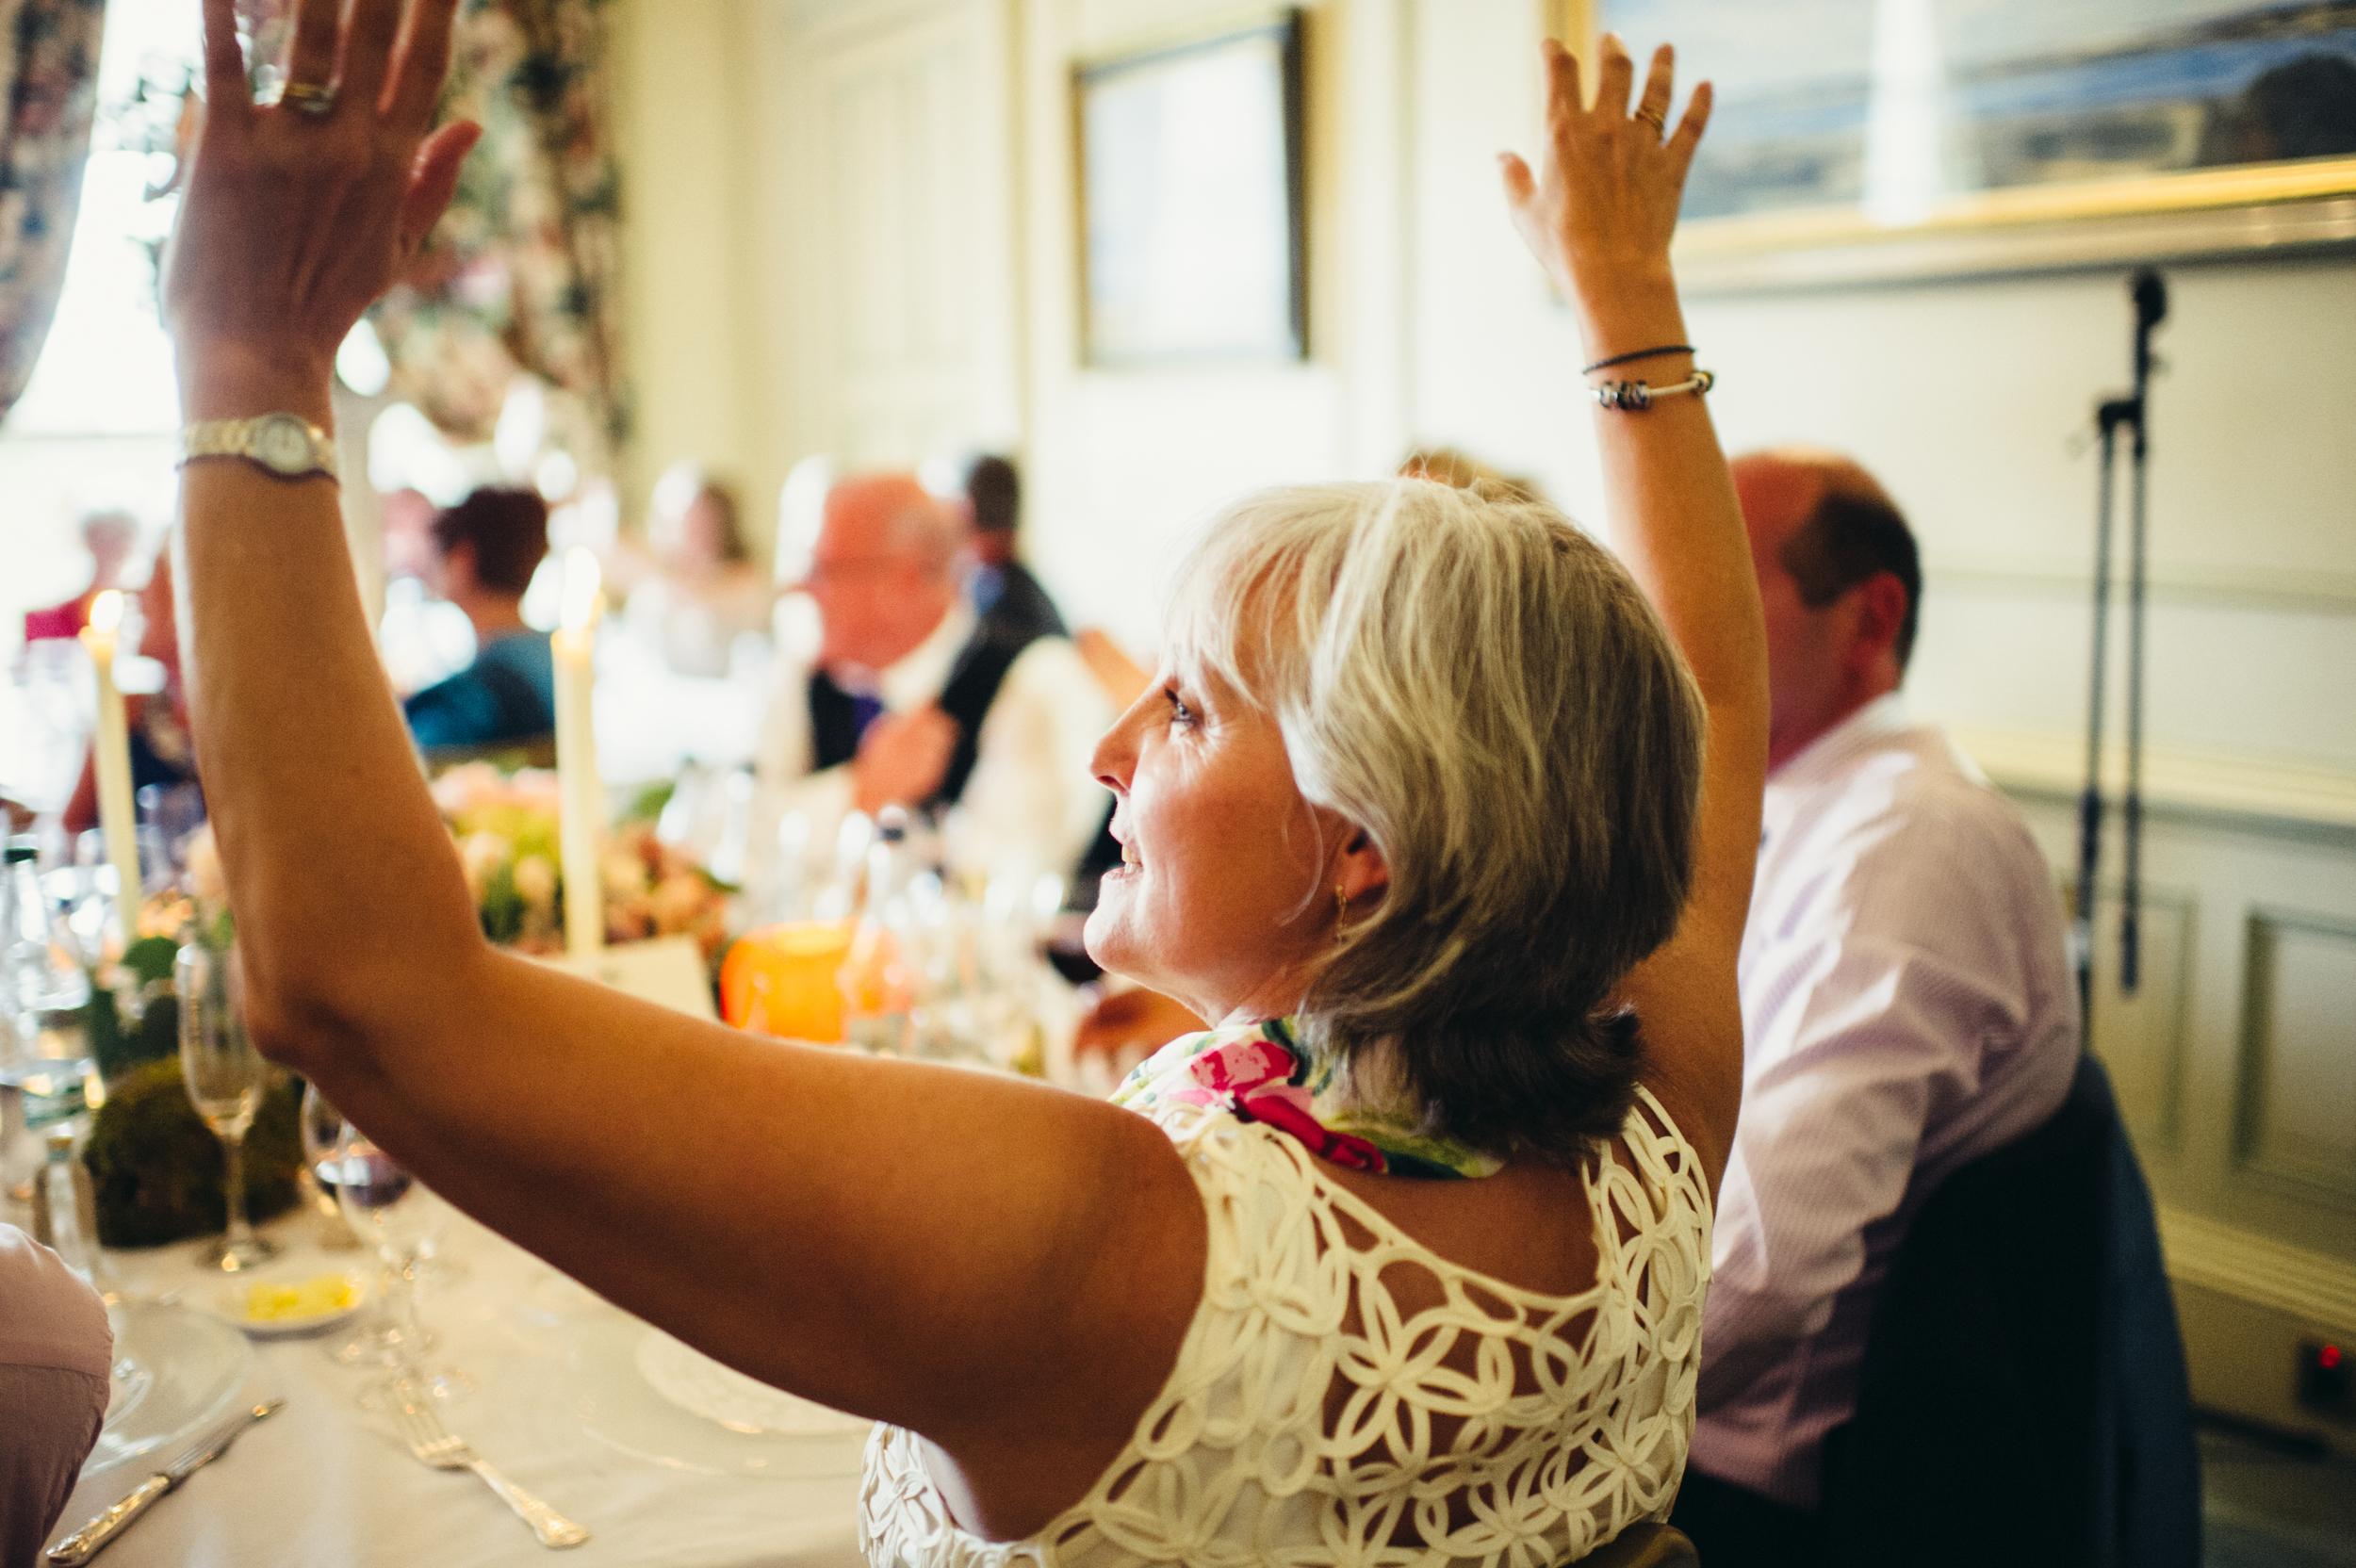 0169-lisa-devine-alternative-creative-wedding-photography-glasgow-edinburgh.JPG